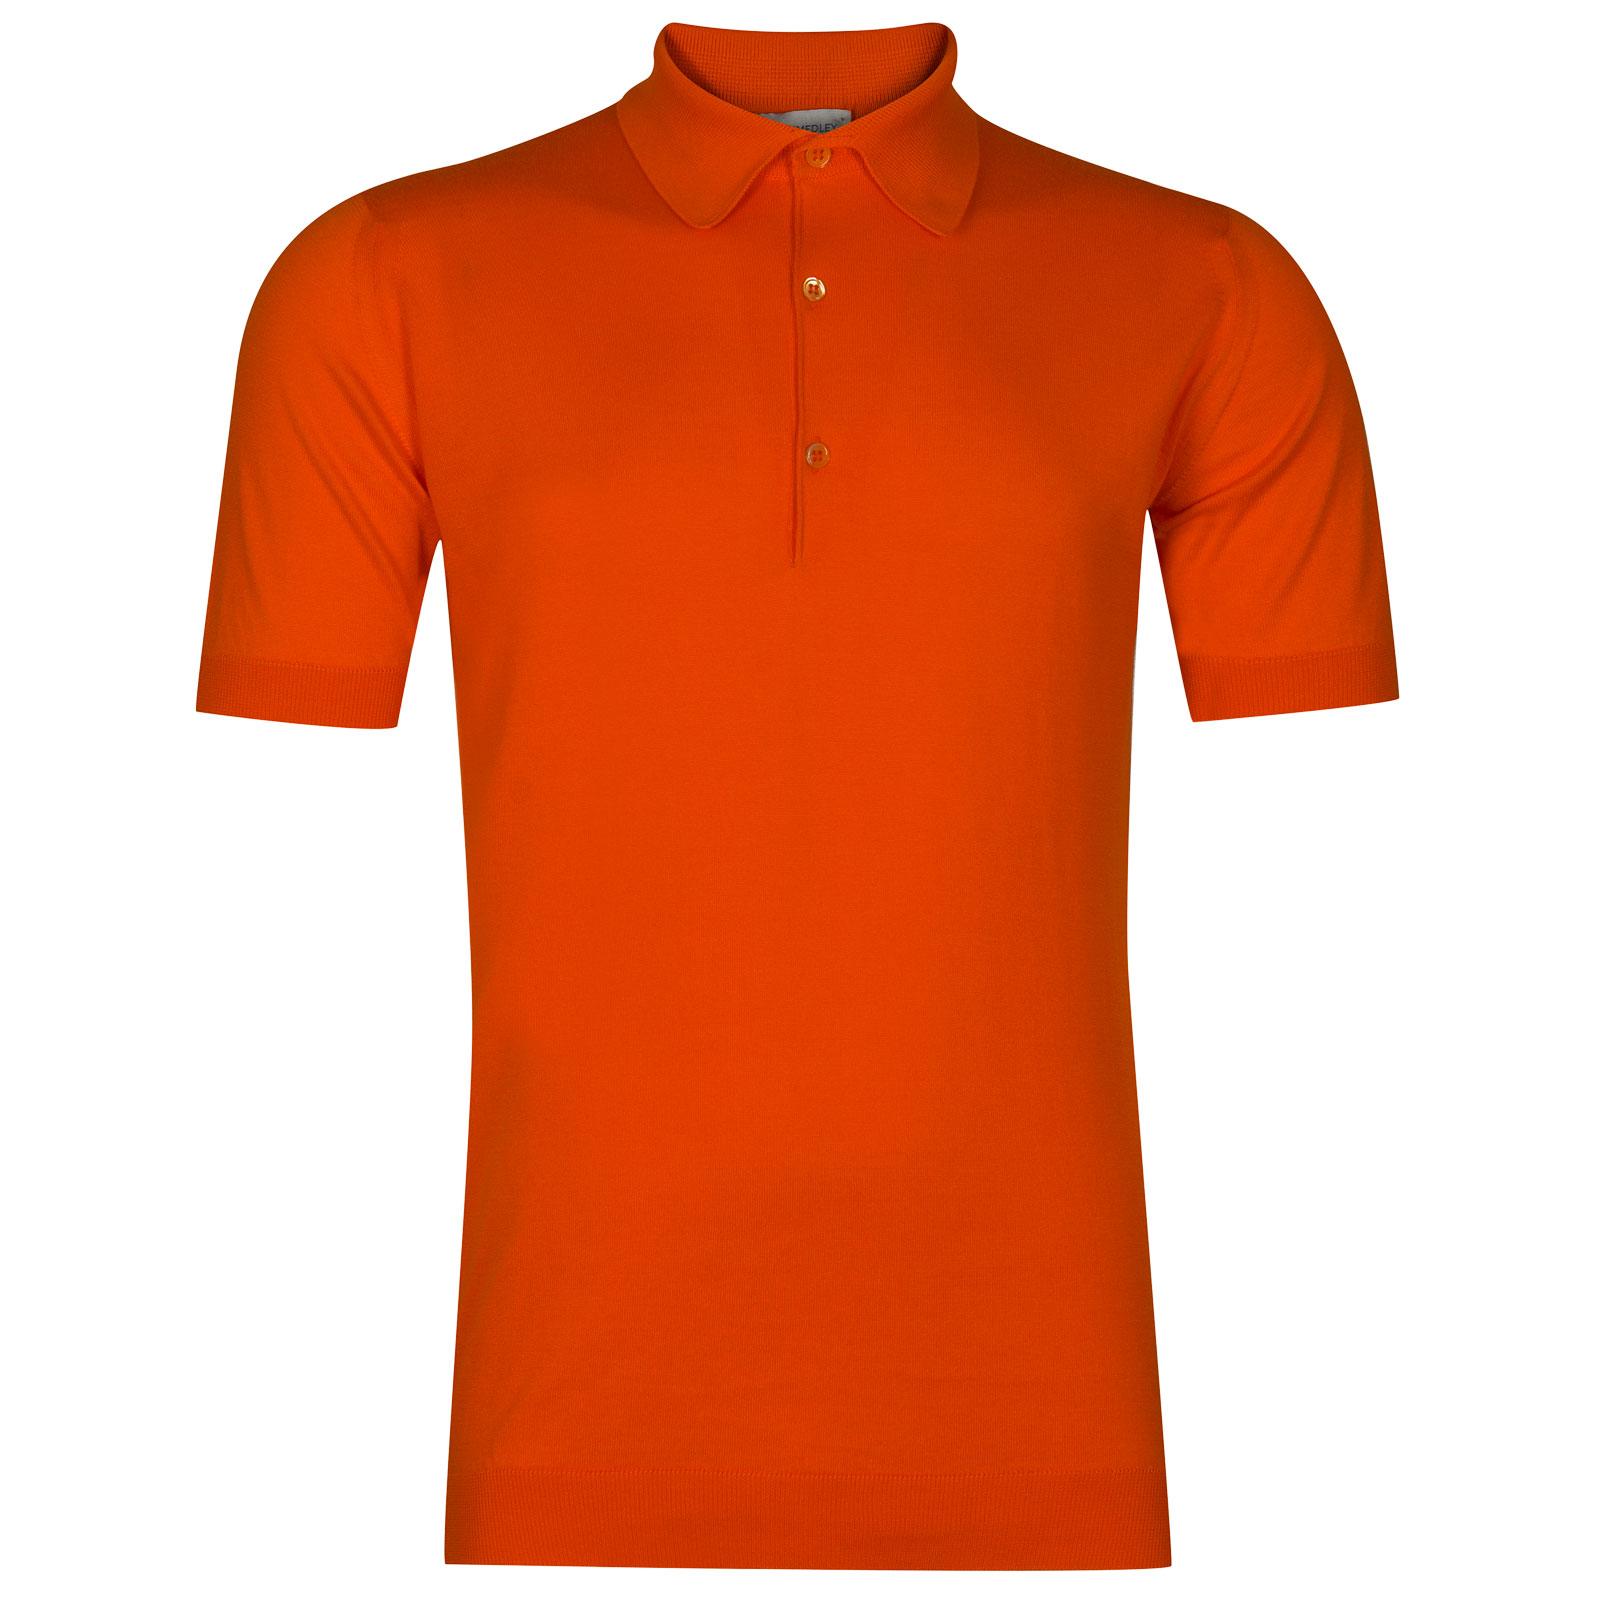 adrian-gehry-orange-S